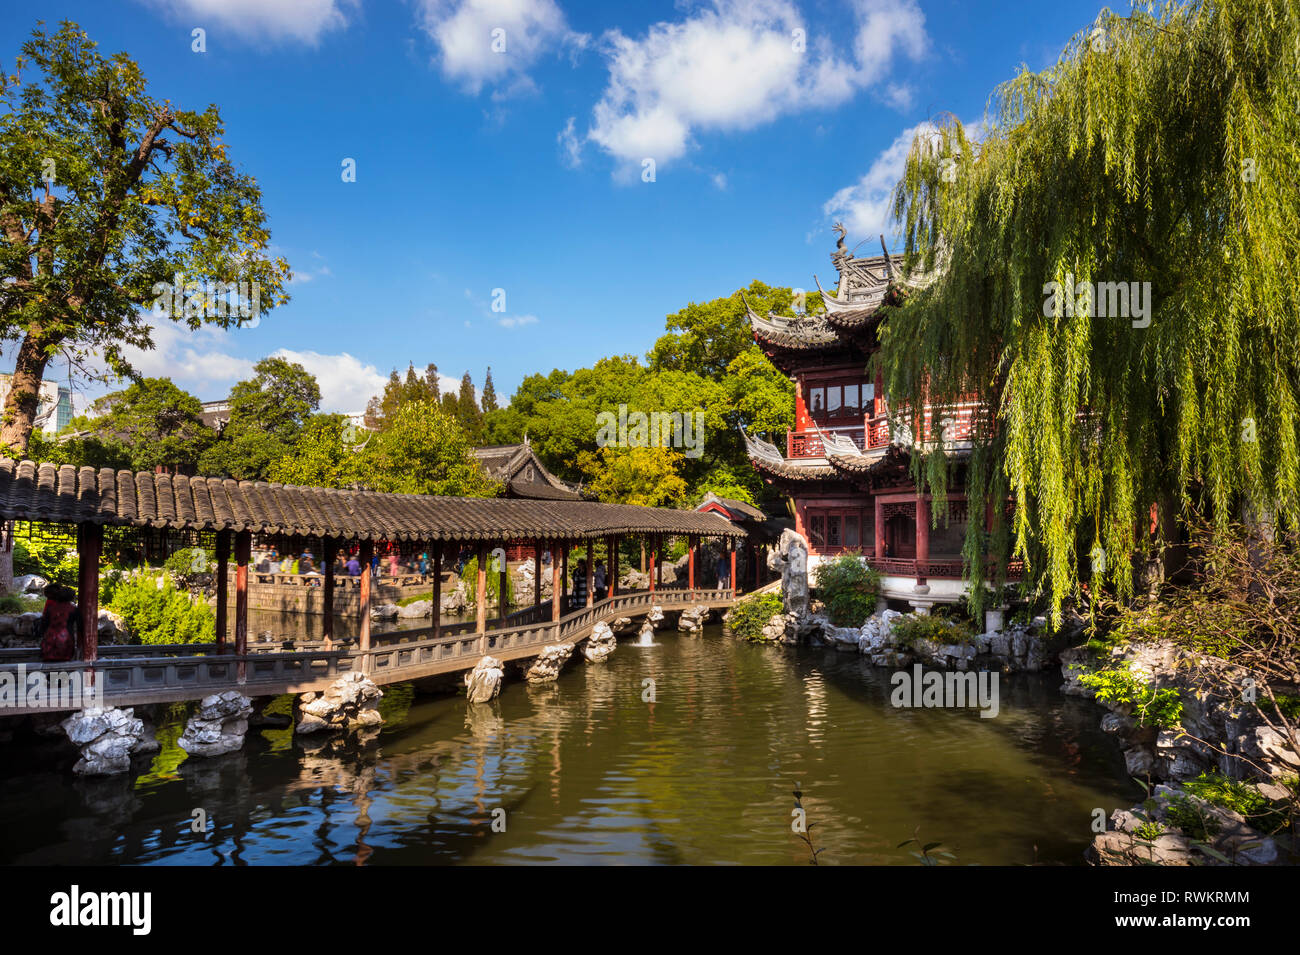 Pavilion of Listening to Billows in Yu Garden, Shanghai, China Stock Photo